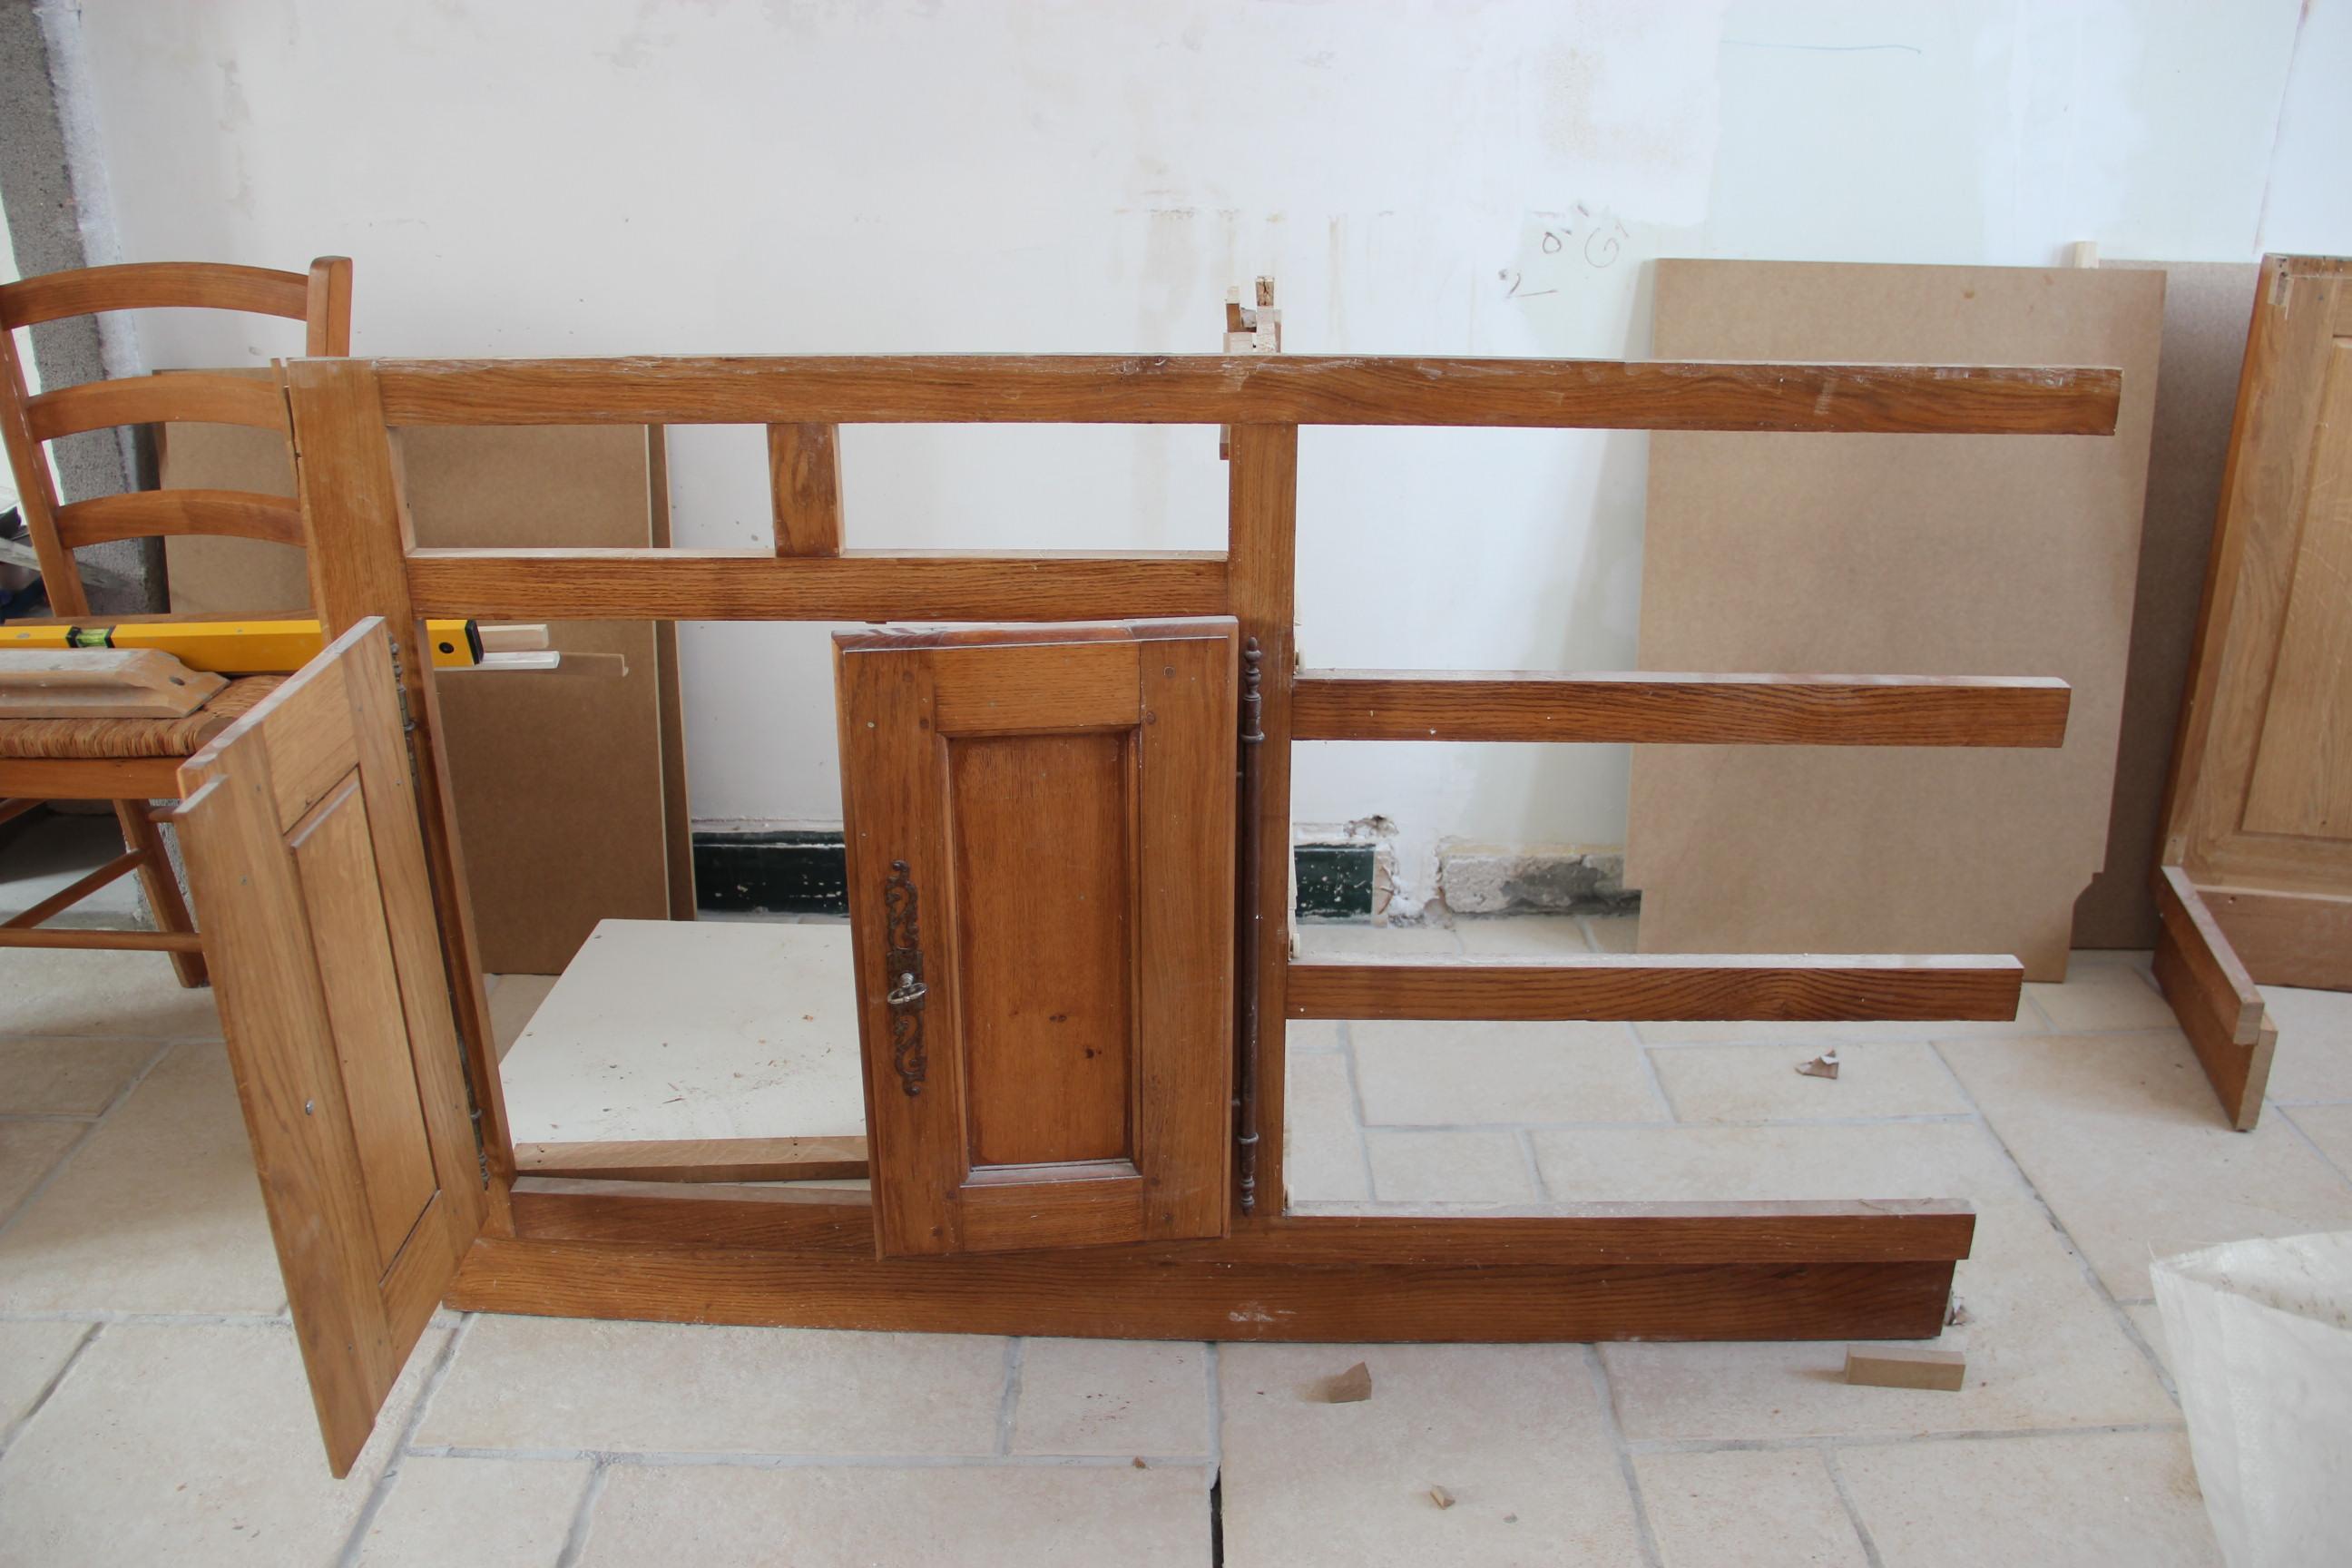 Casserolier - Photos de meubles repeints ...